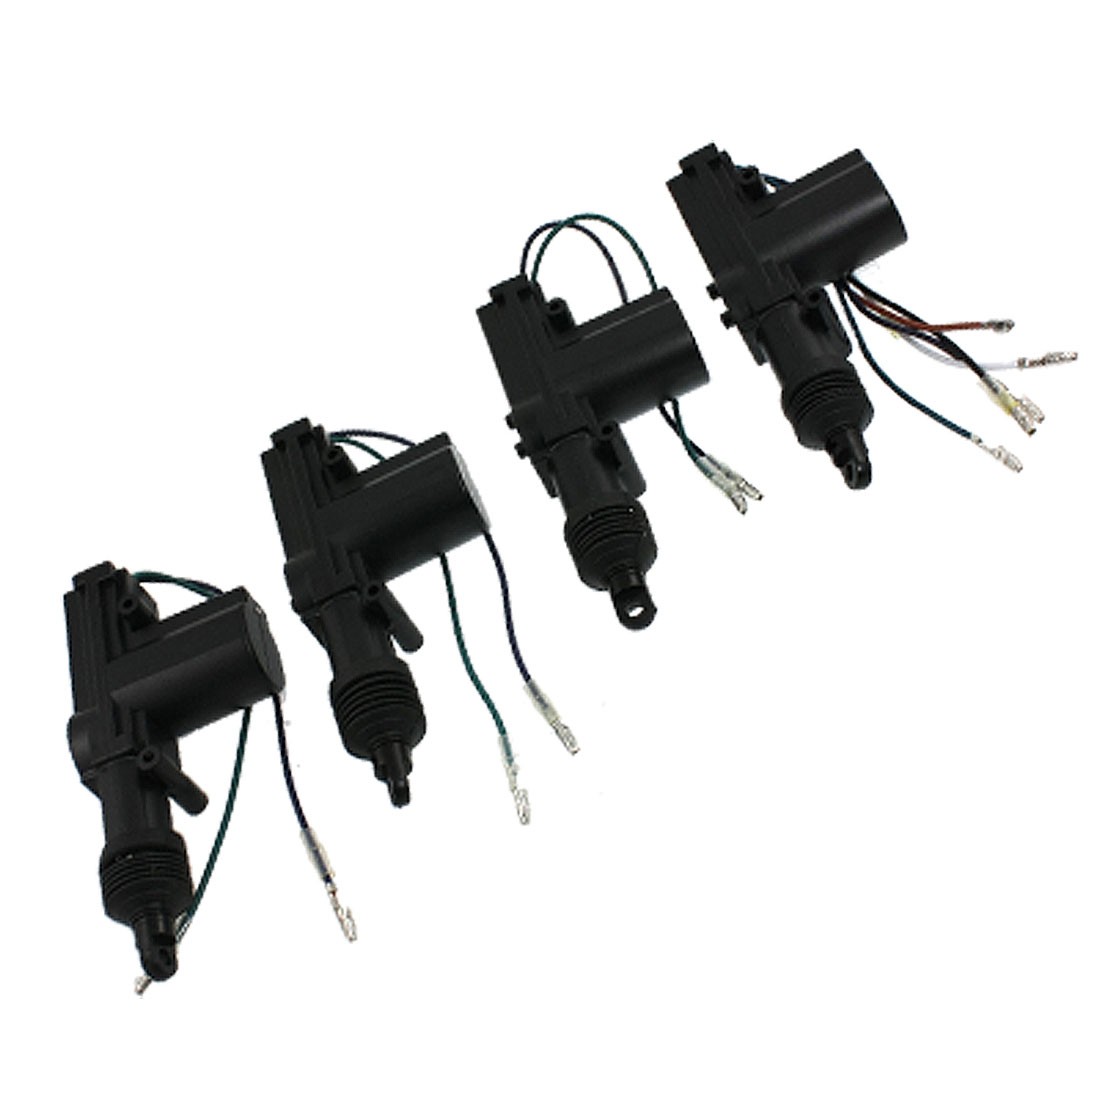 Car Locking System 2 Wires Slaves Central Door Lock Actuator Black